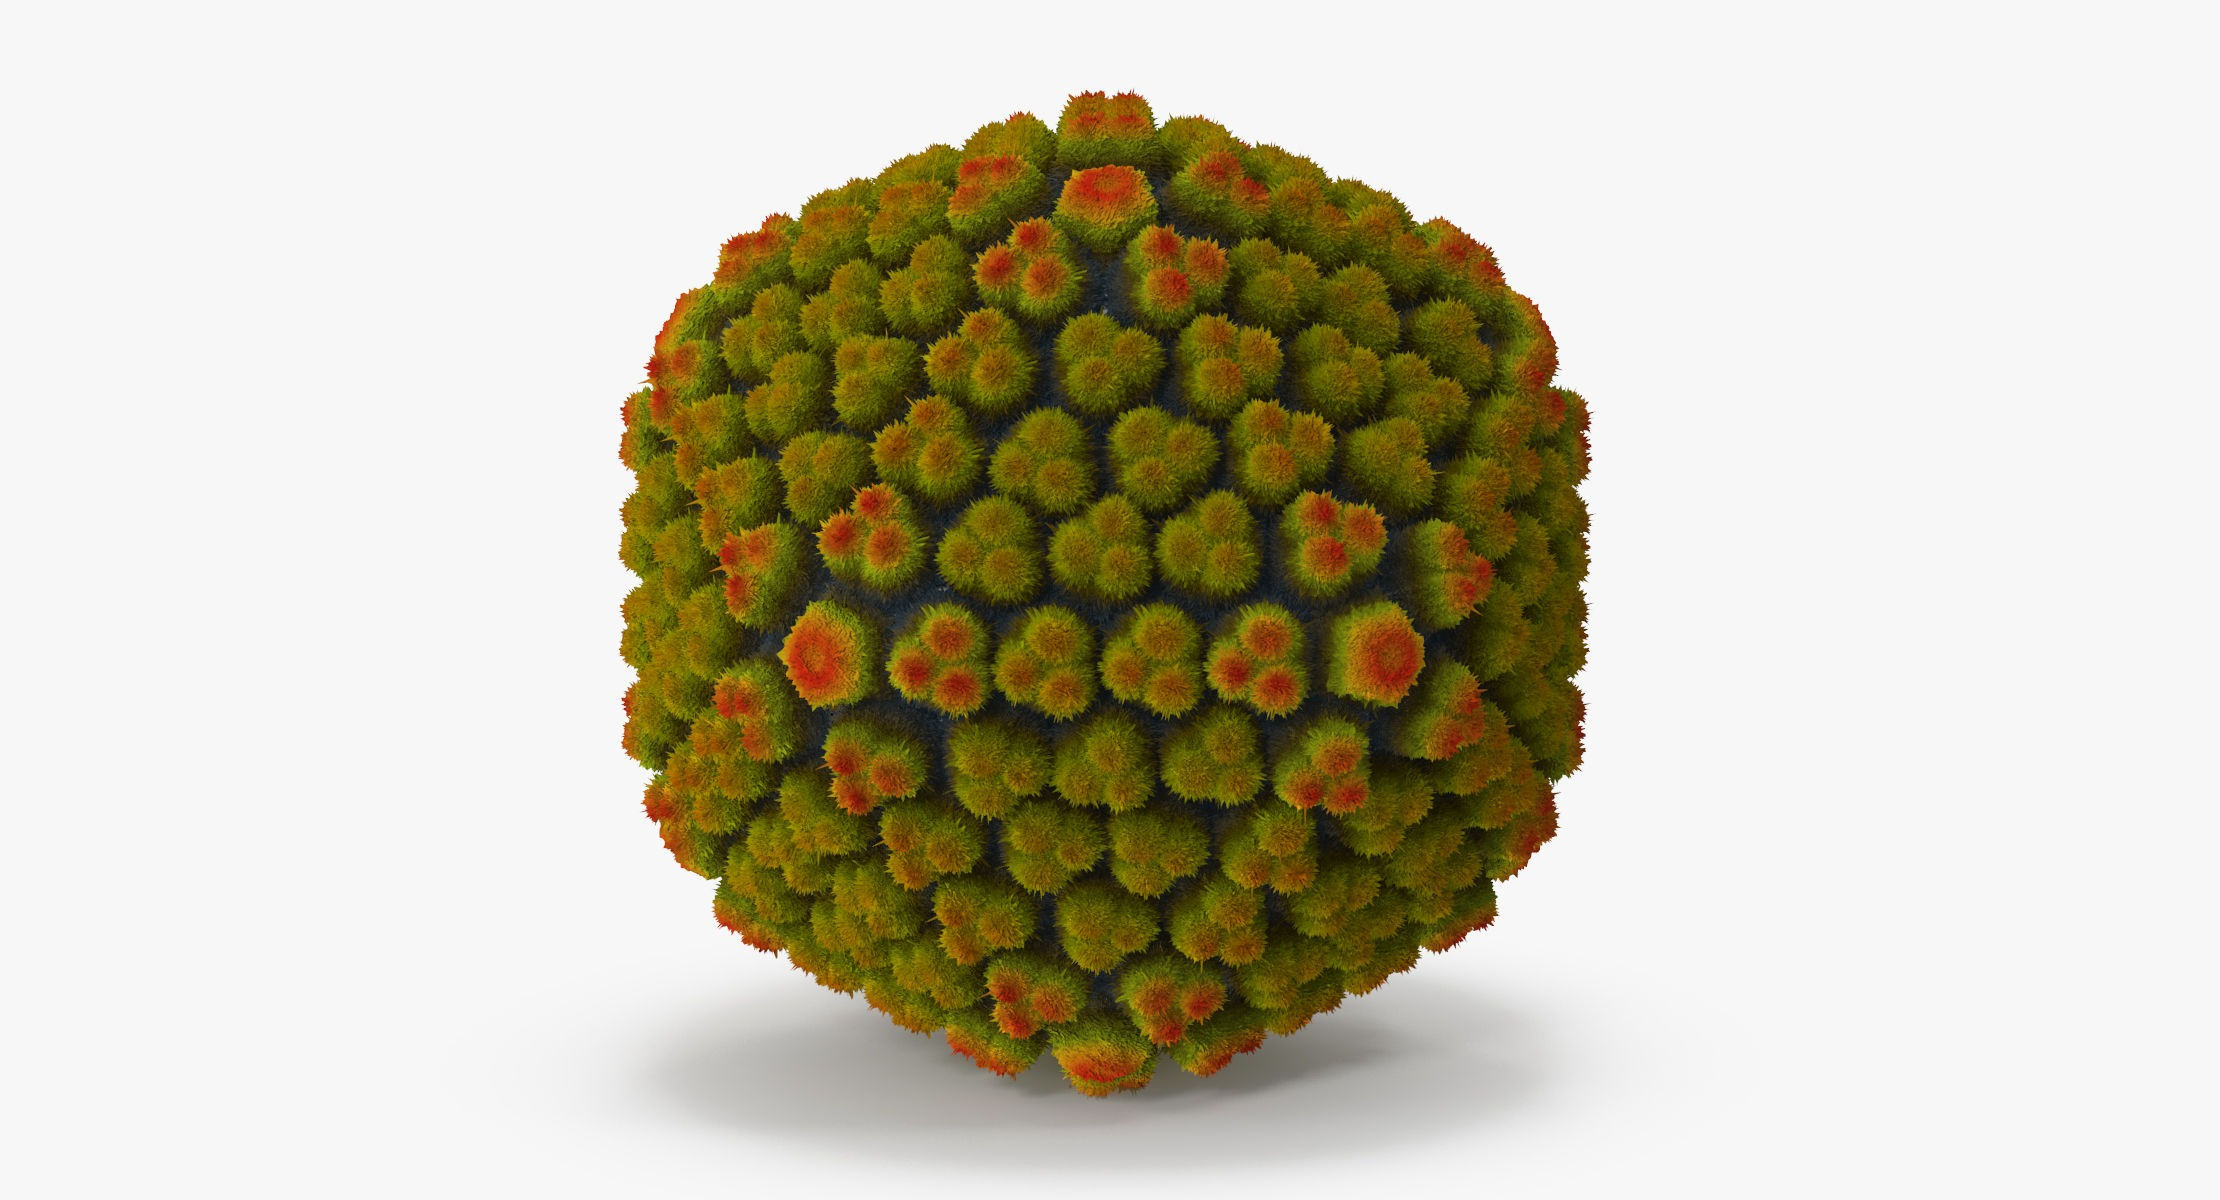 Adenovirus - reel 1